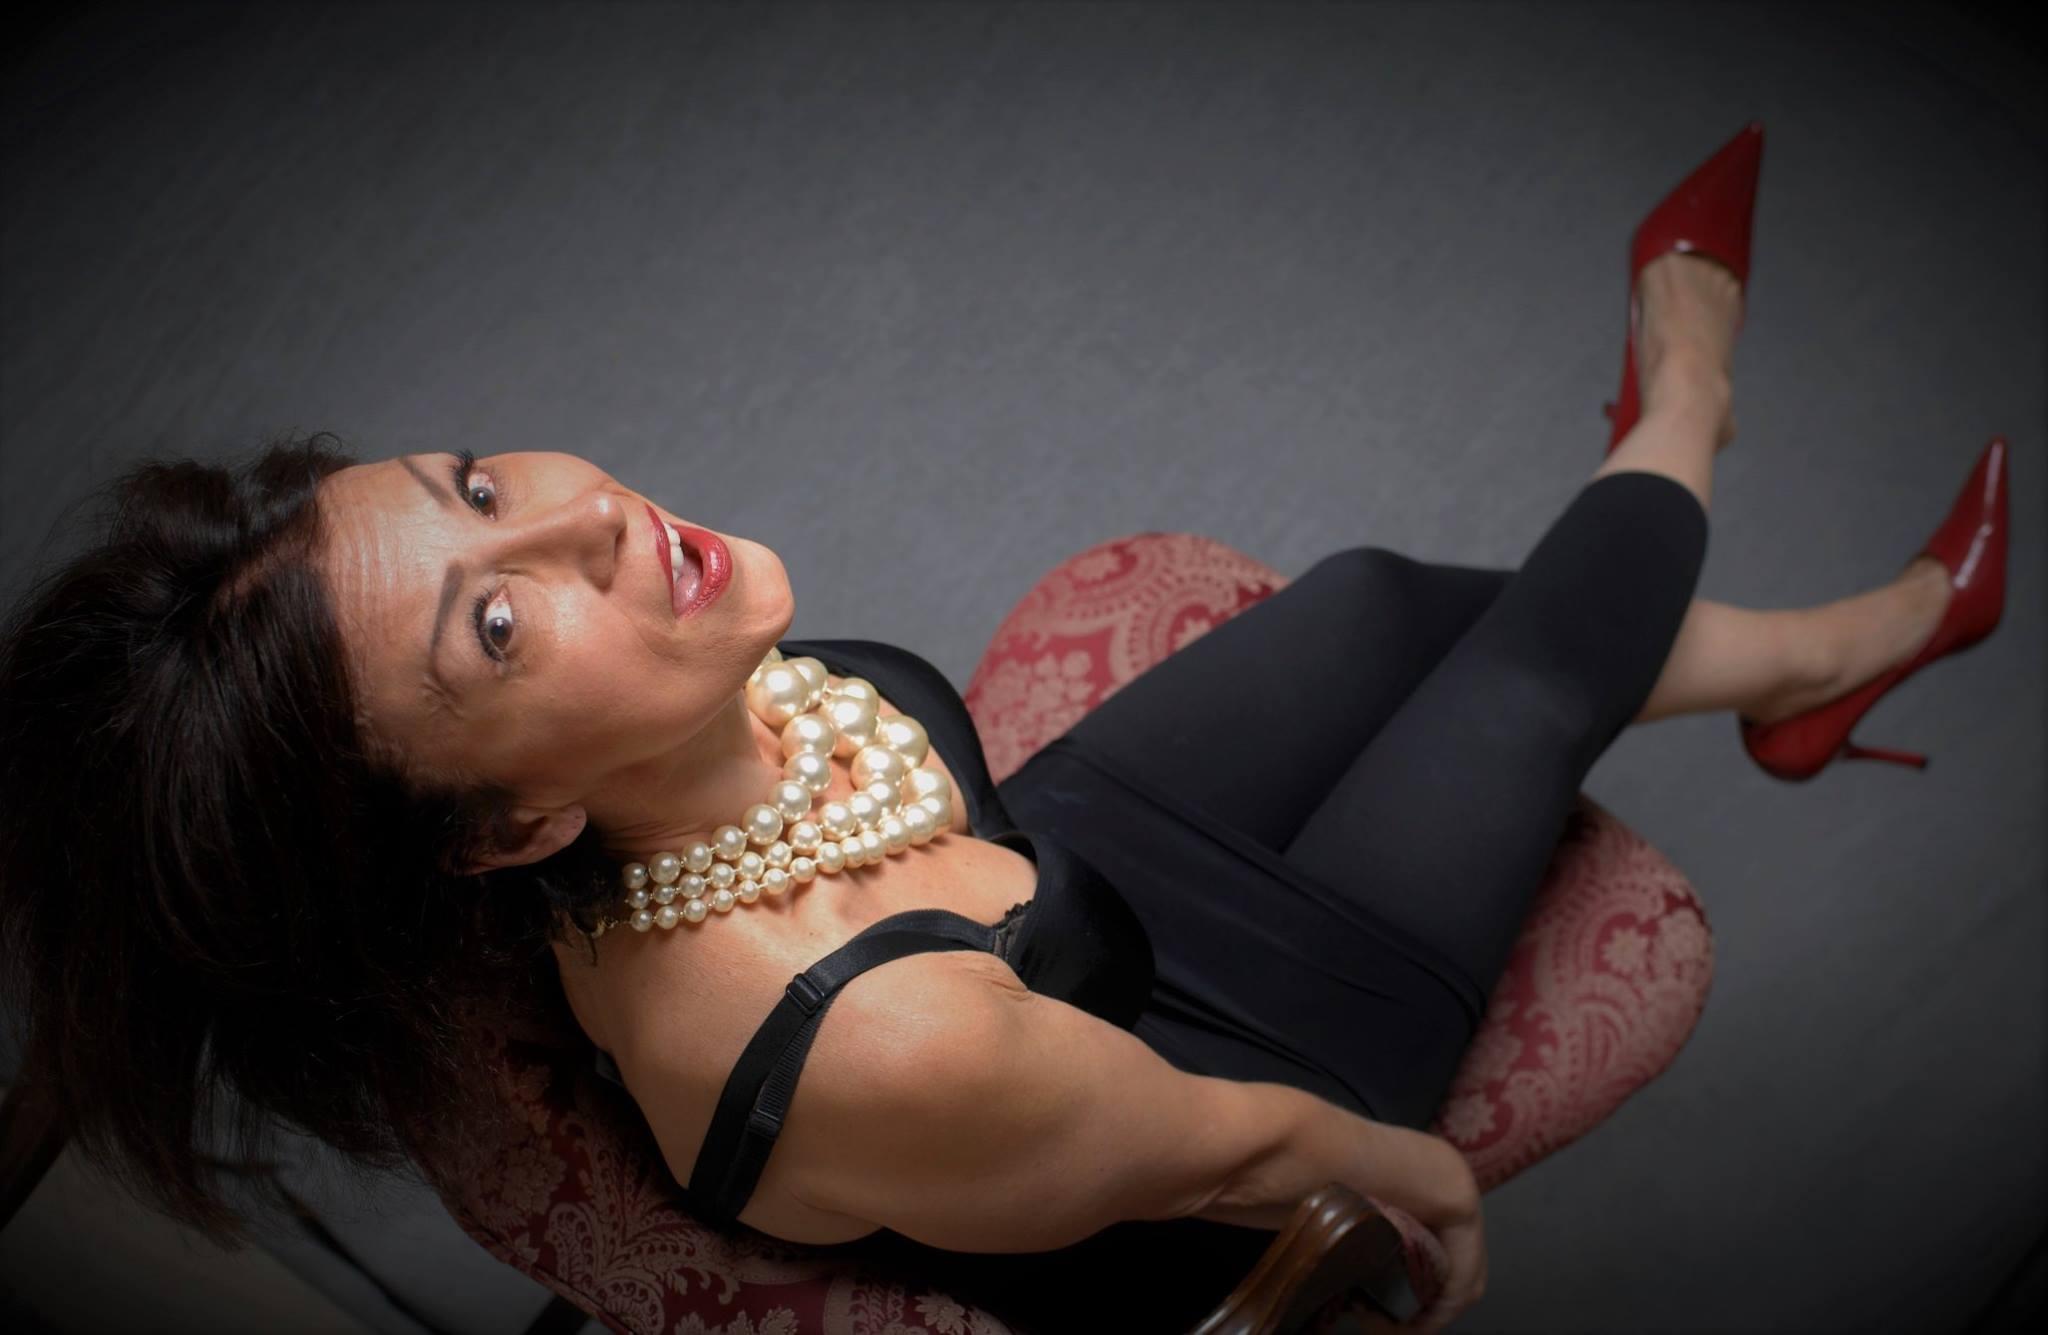 Lisa Ellex - Street Secret Producer